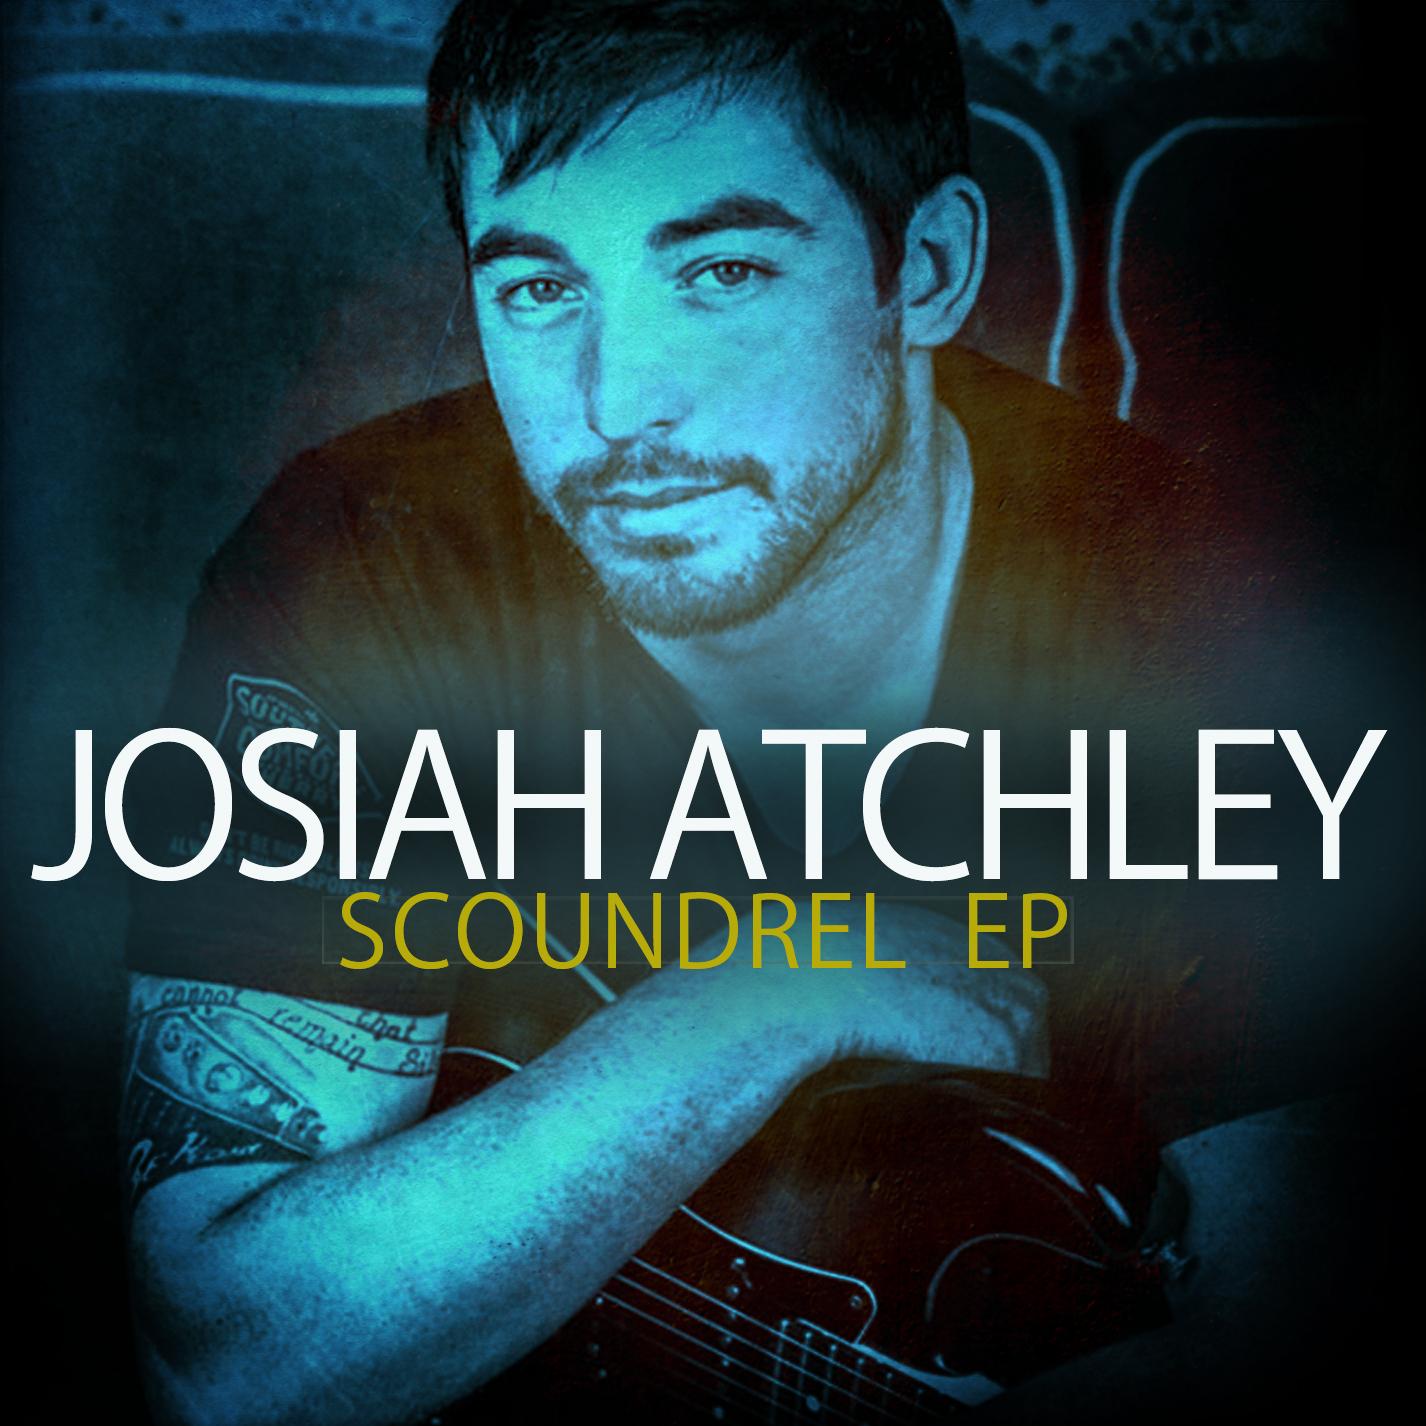 Album art for Scoundrel EP